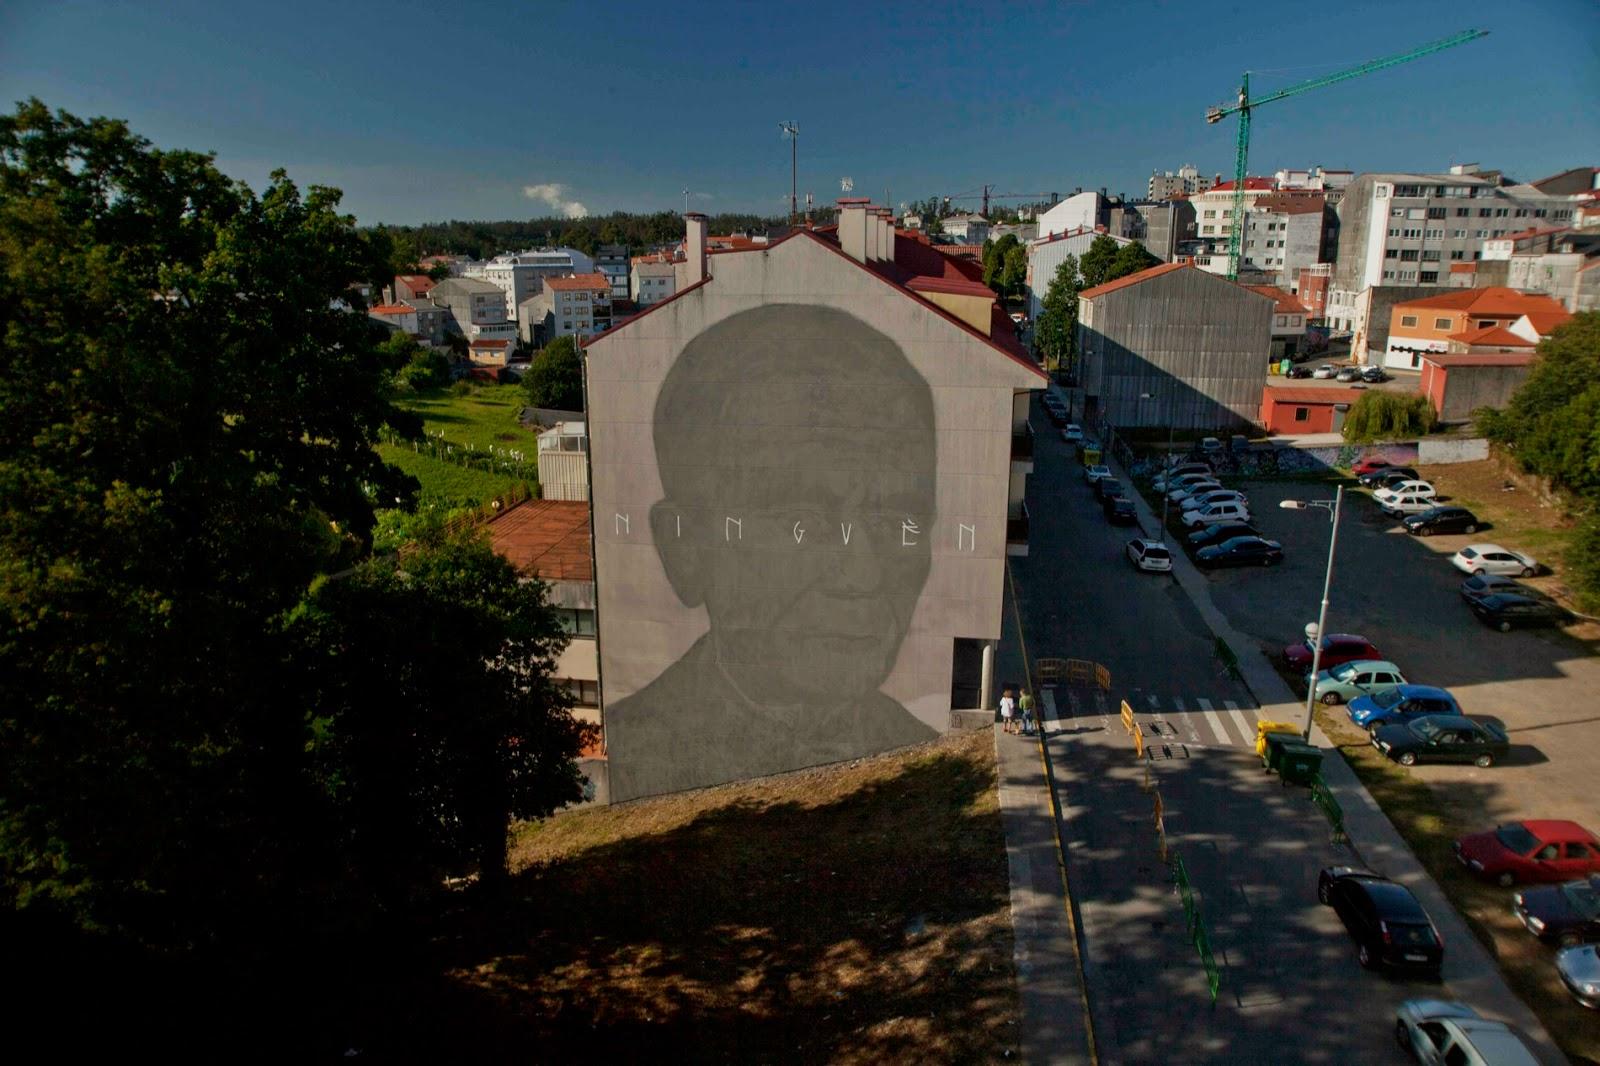 axel-void-new-mural-for-desordes-creativas-2014-01